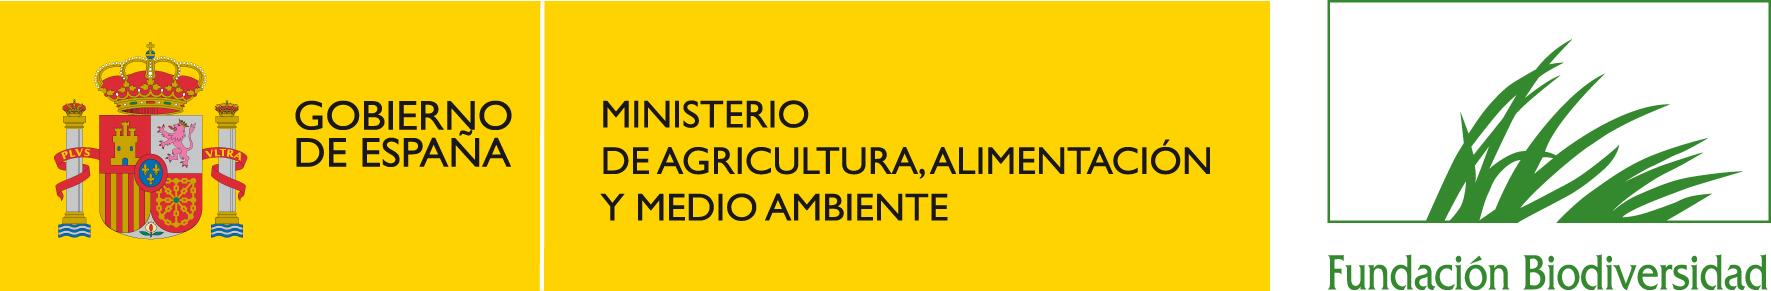 logo color FB